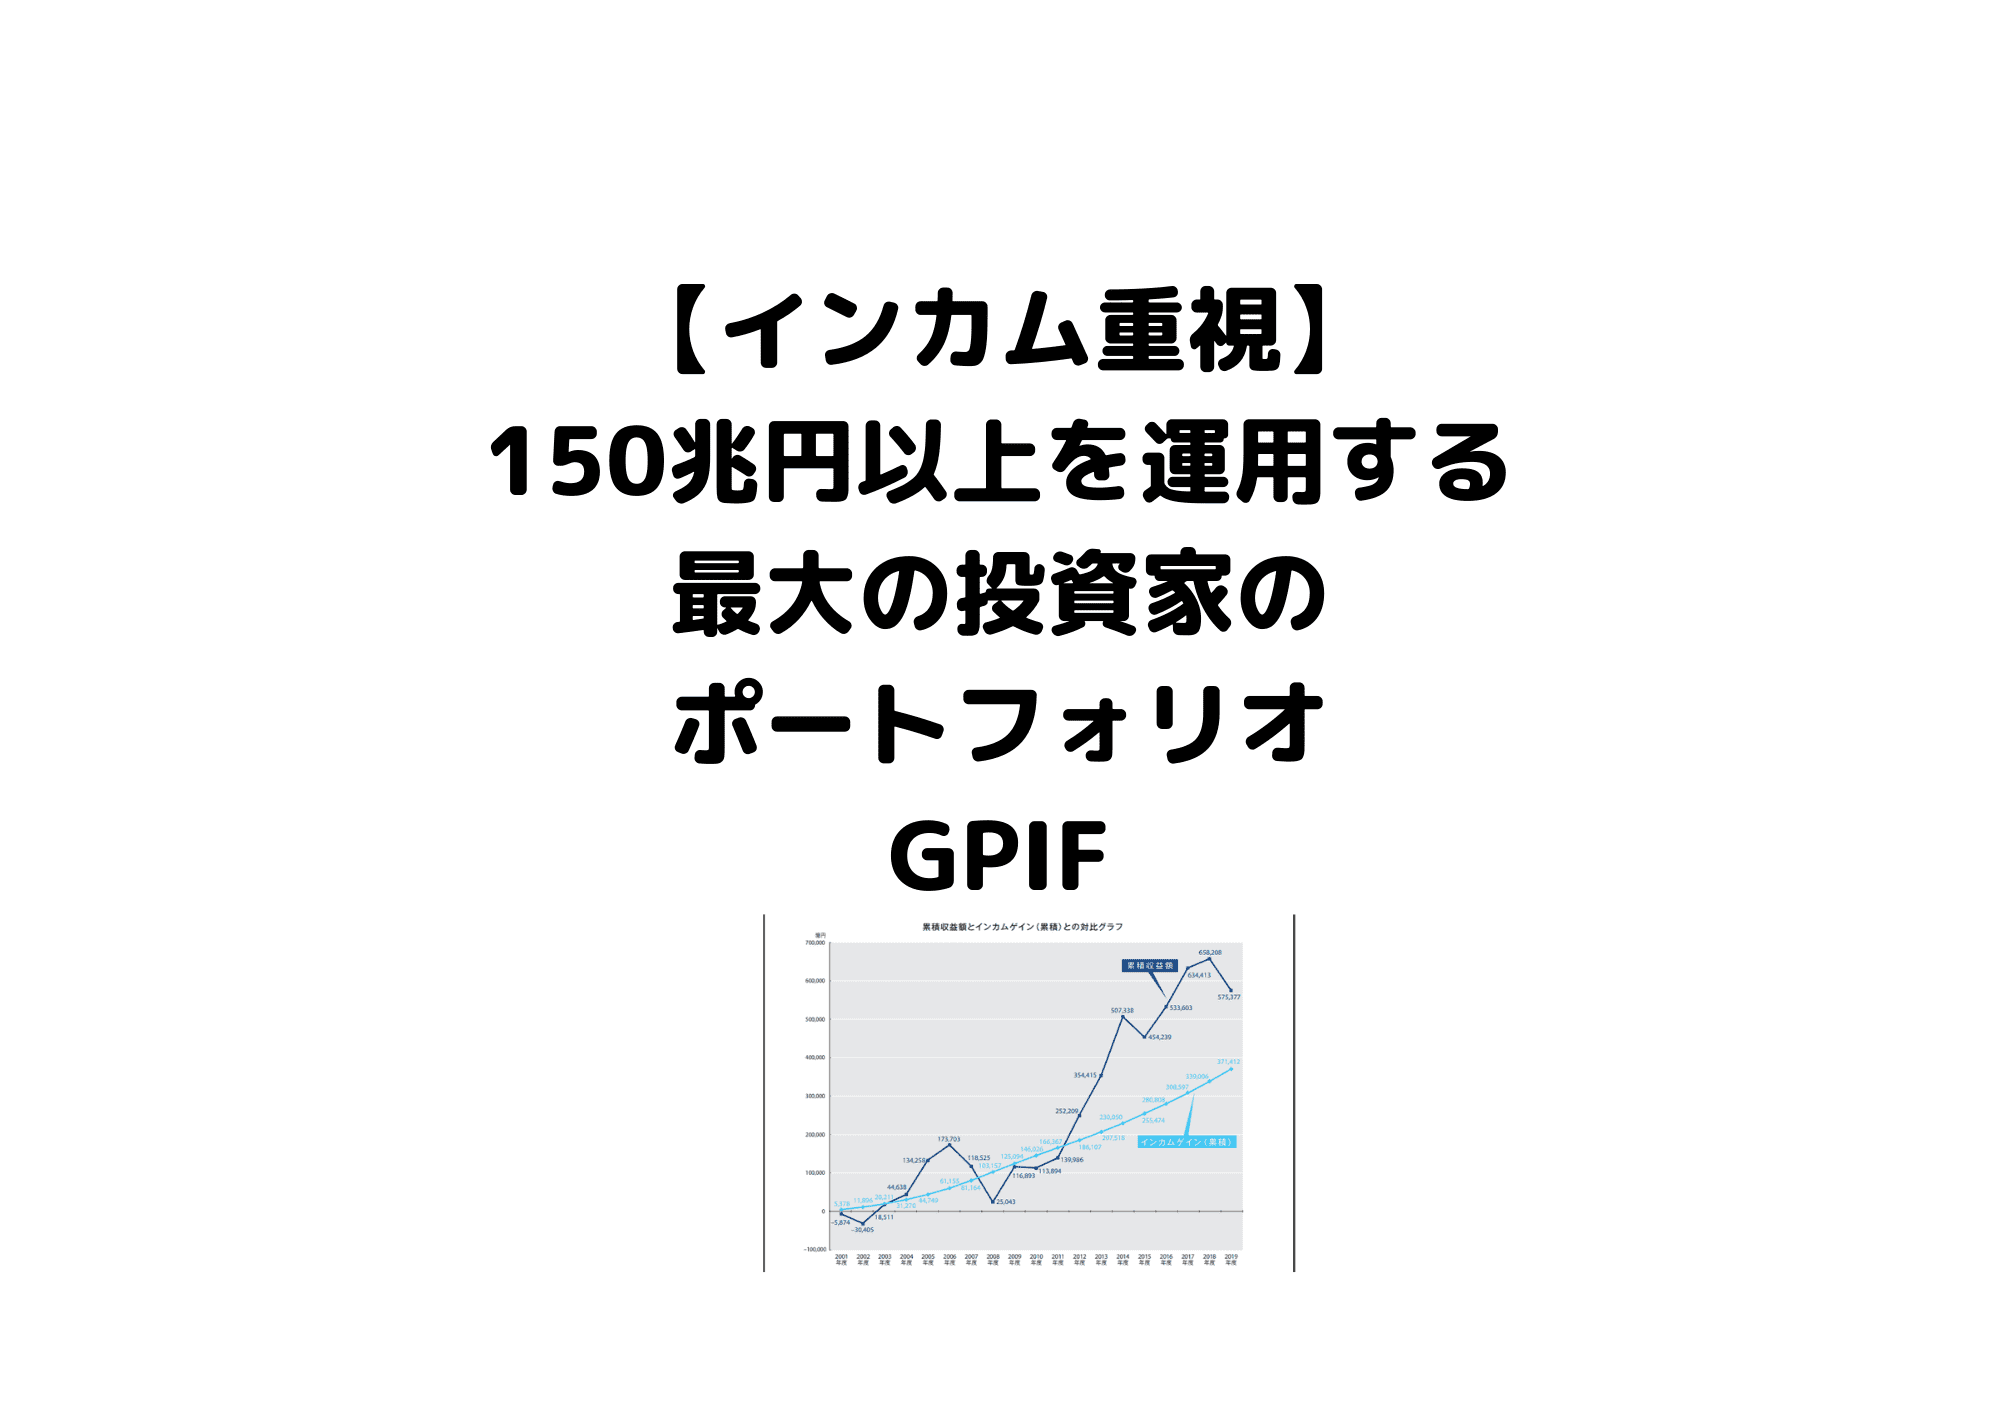 GPIF インカム重視